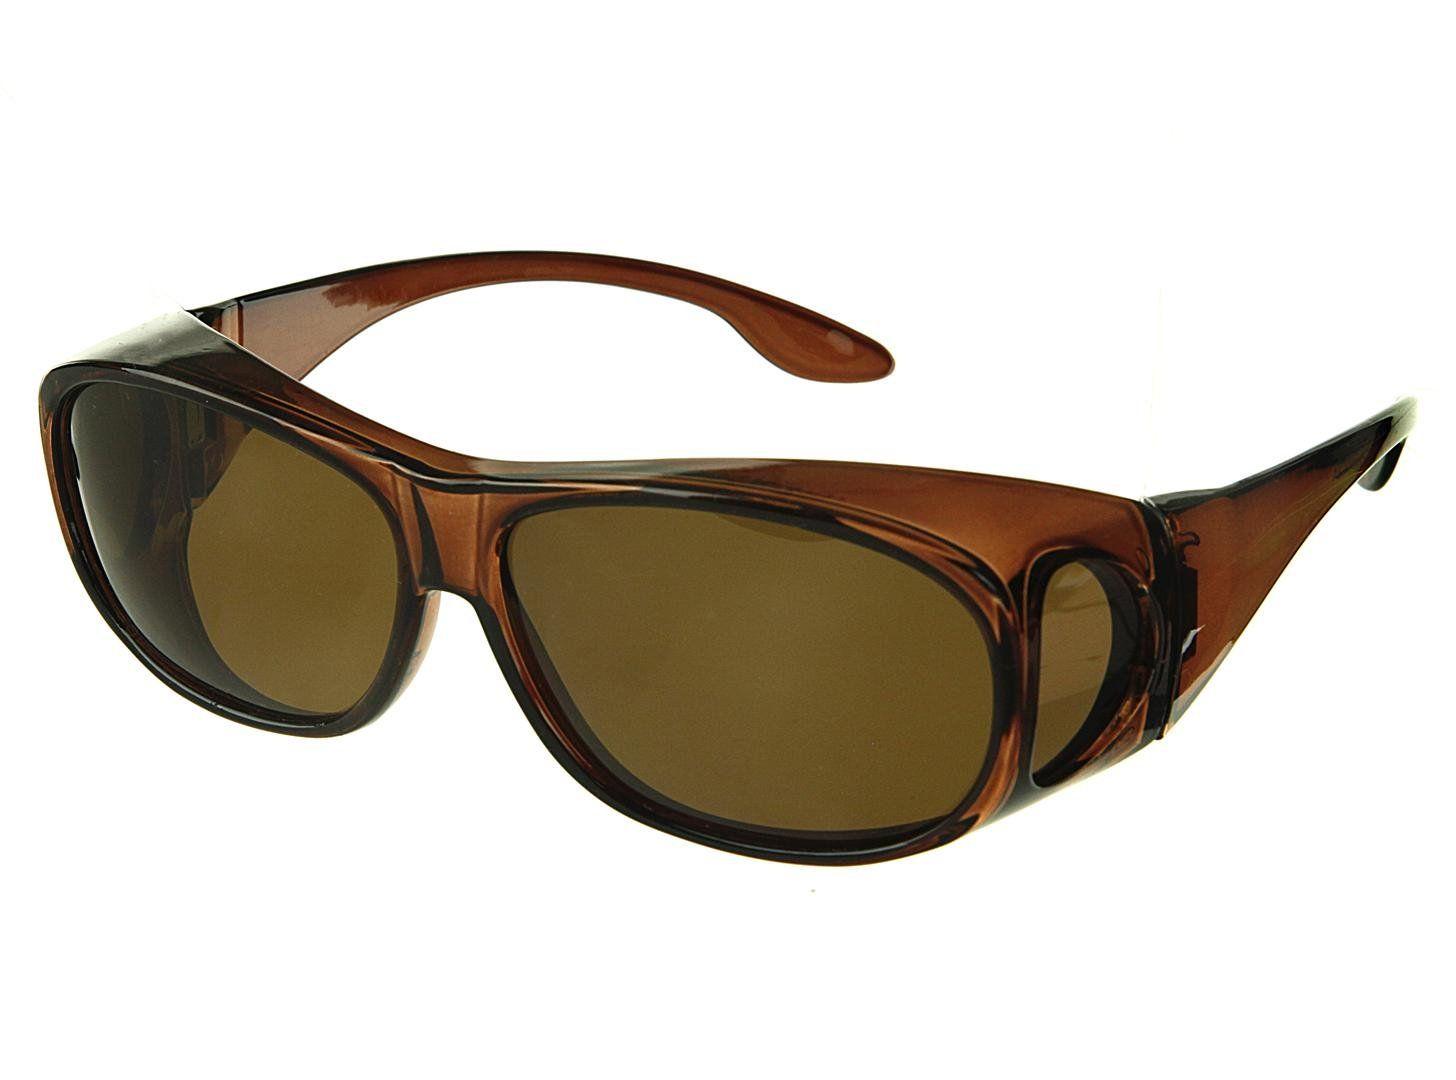 0487aaa4270 LensCovers Sunglasses Wear Over Prescription Glasses. Polarized Size Medium.